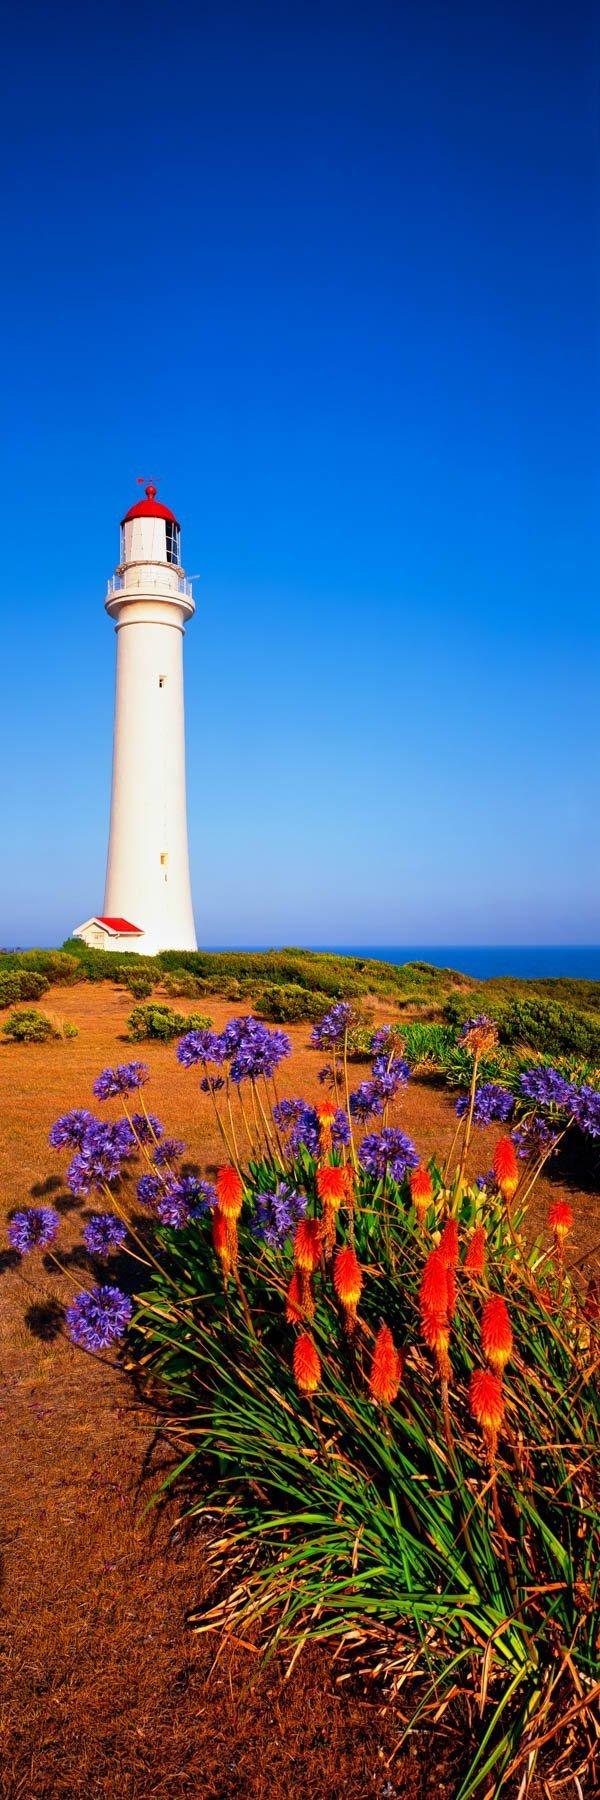 Vertical image of Split Point Lighthouse, Victoria, Australia.